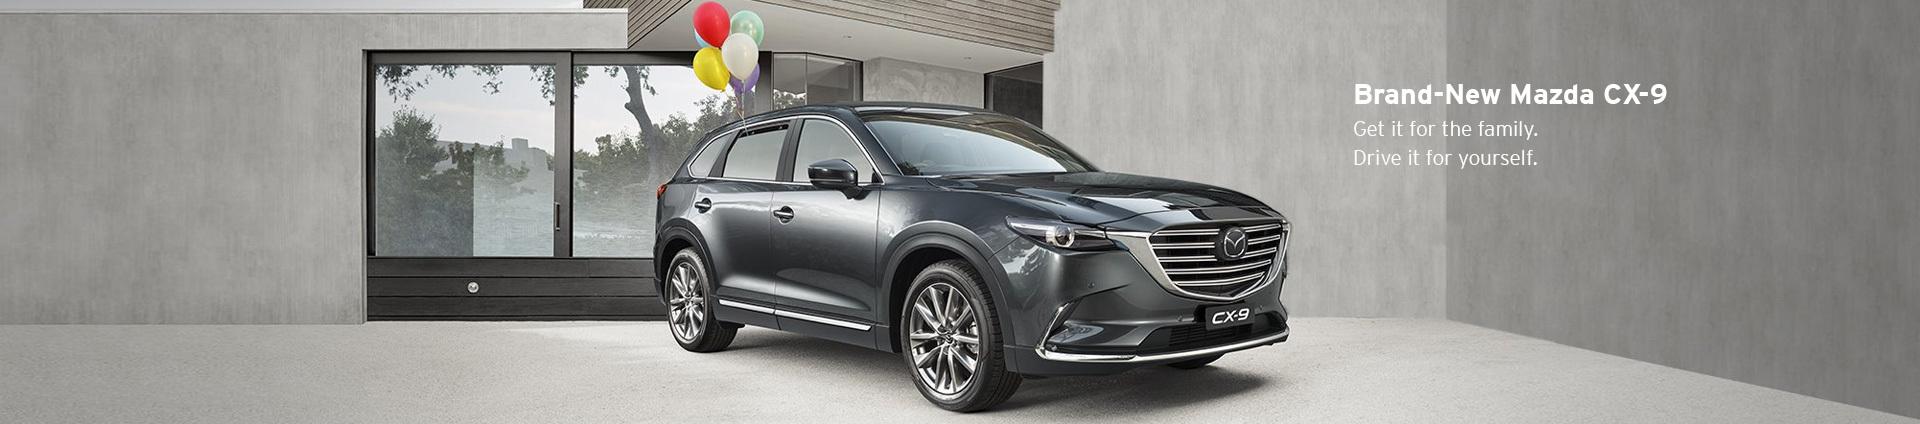 Brand-New Mazda CX-9